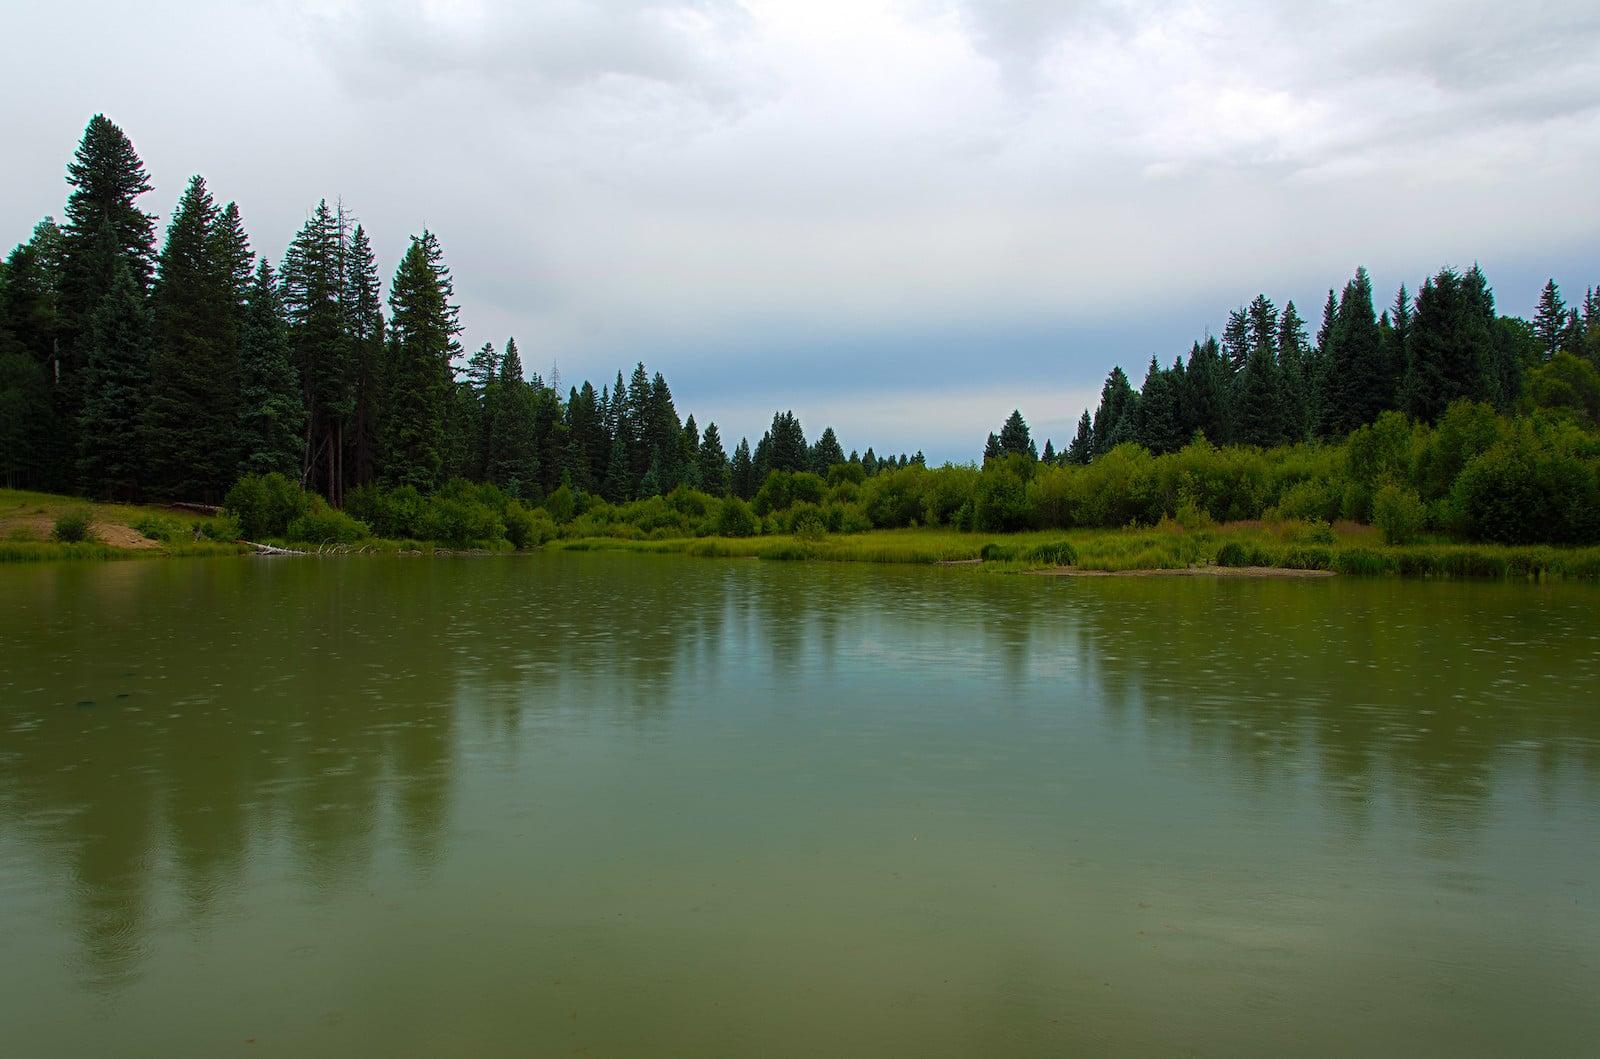 Image of Opal Lake in Pagosa, Colorado